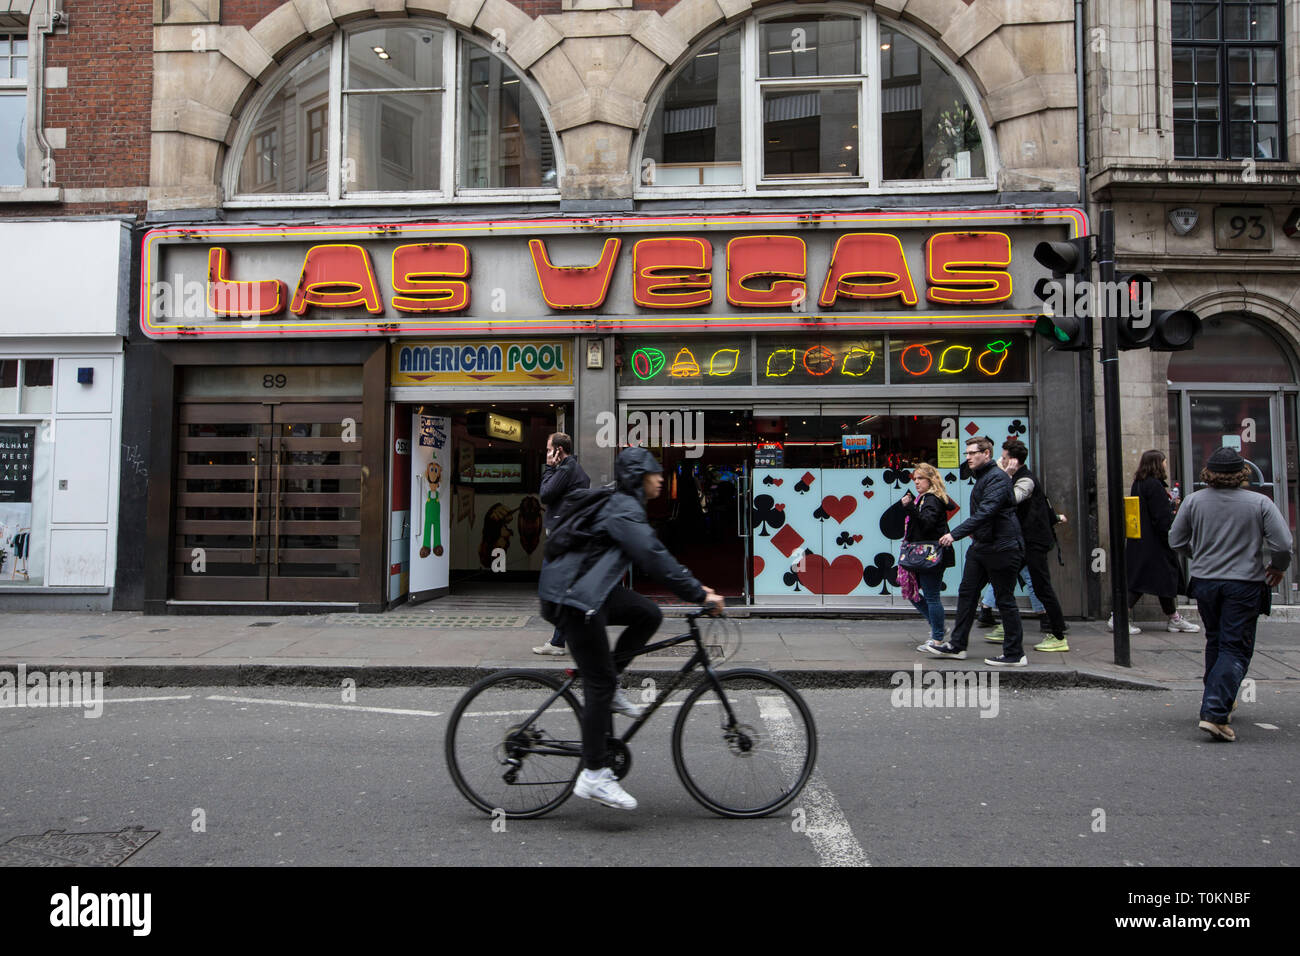 Las Vegas amusement arcade, Wardour Street, Soho, London, England , UK - Stock Image